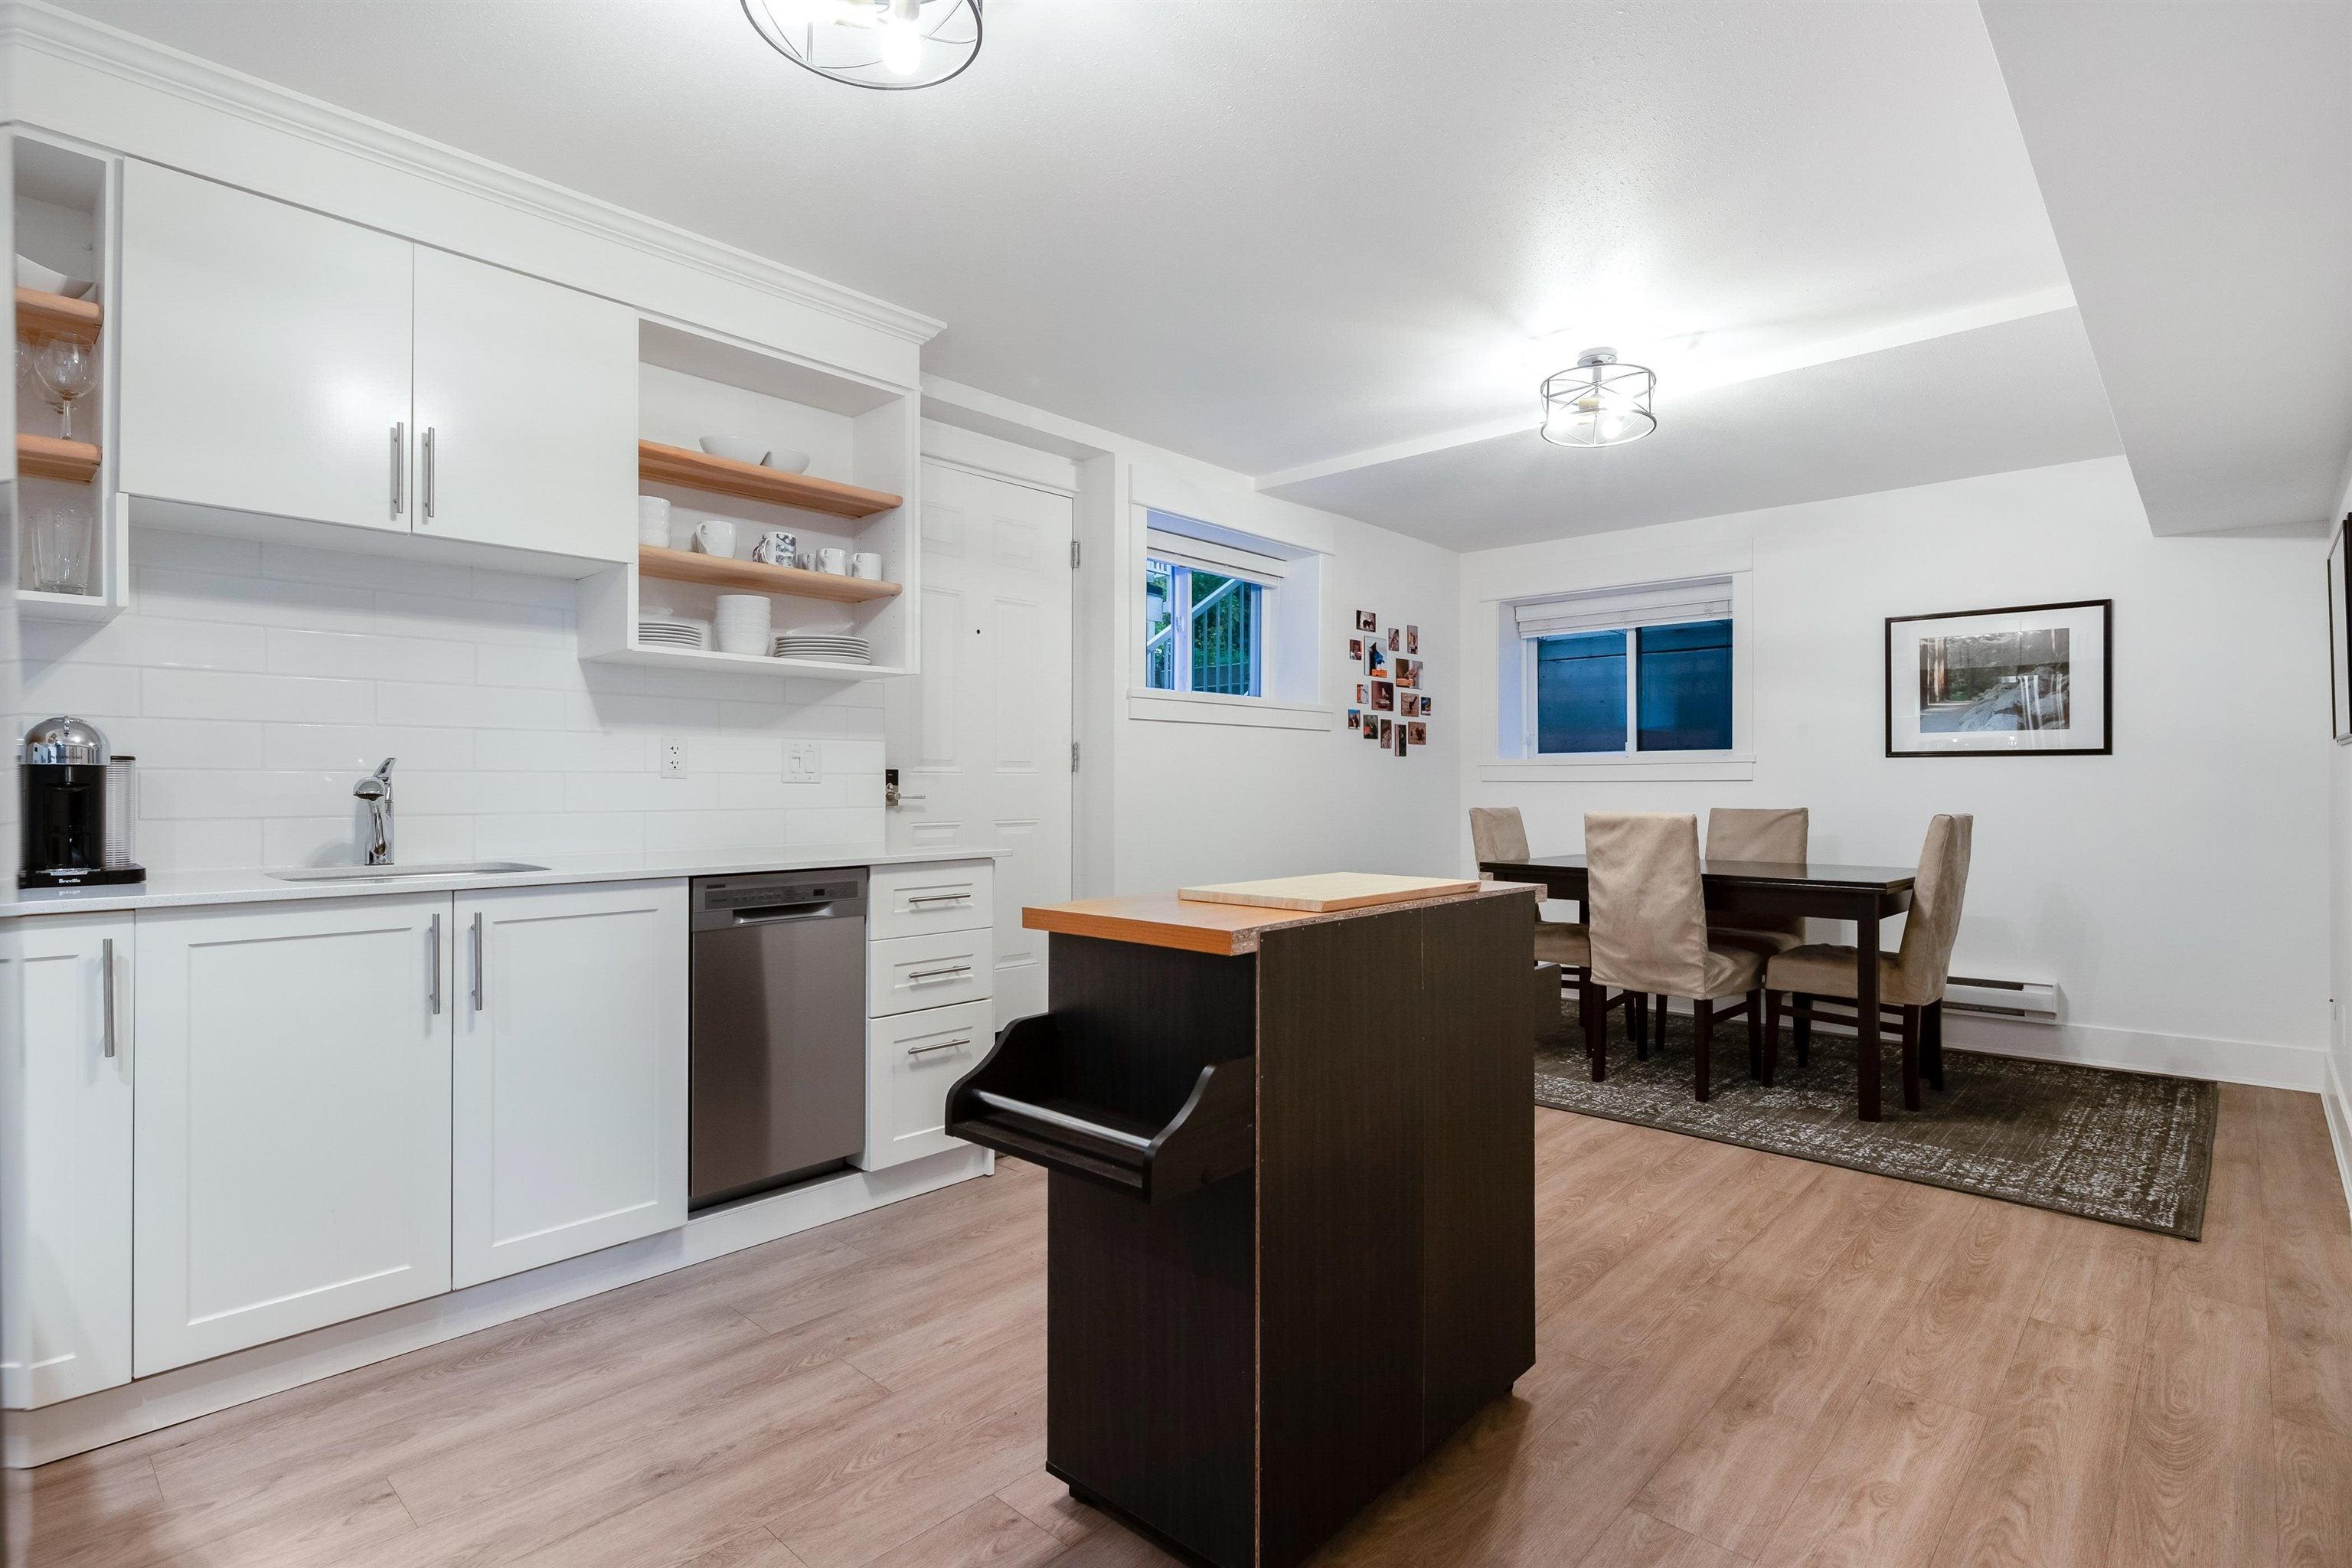 2258 WINDRIDGE DRIVE - Seymour NV House/Single Family for sale, 5 Bedrooms (R2617156) - #29